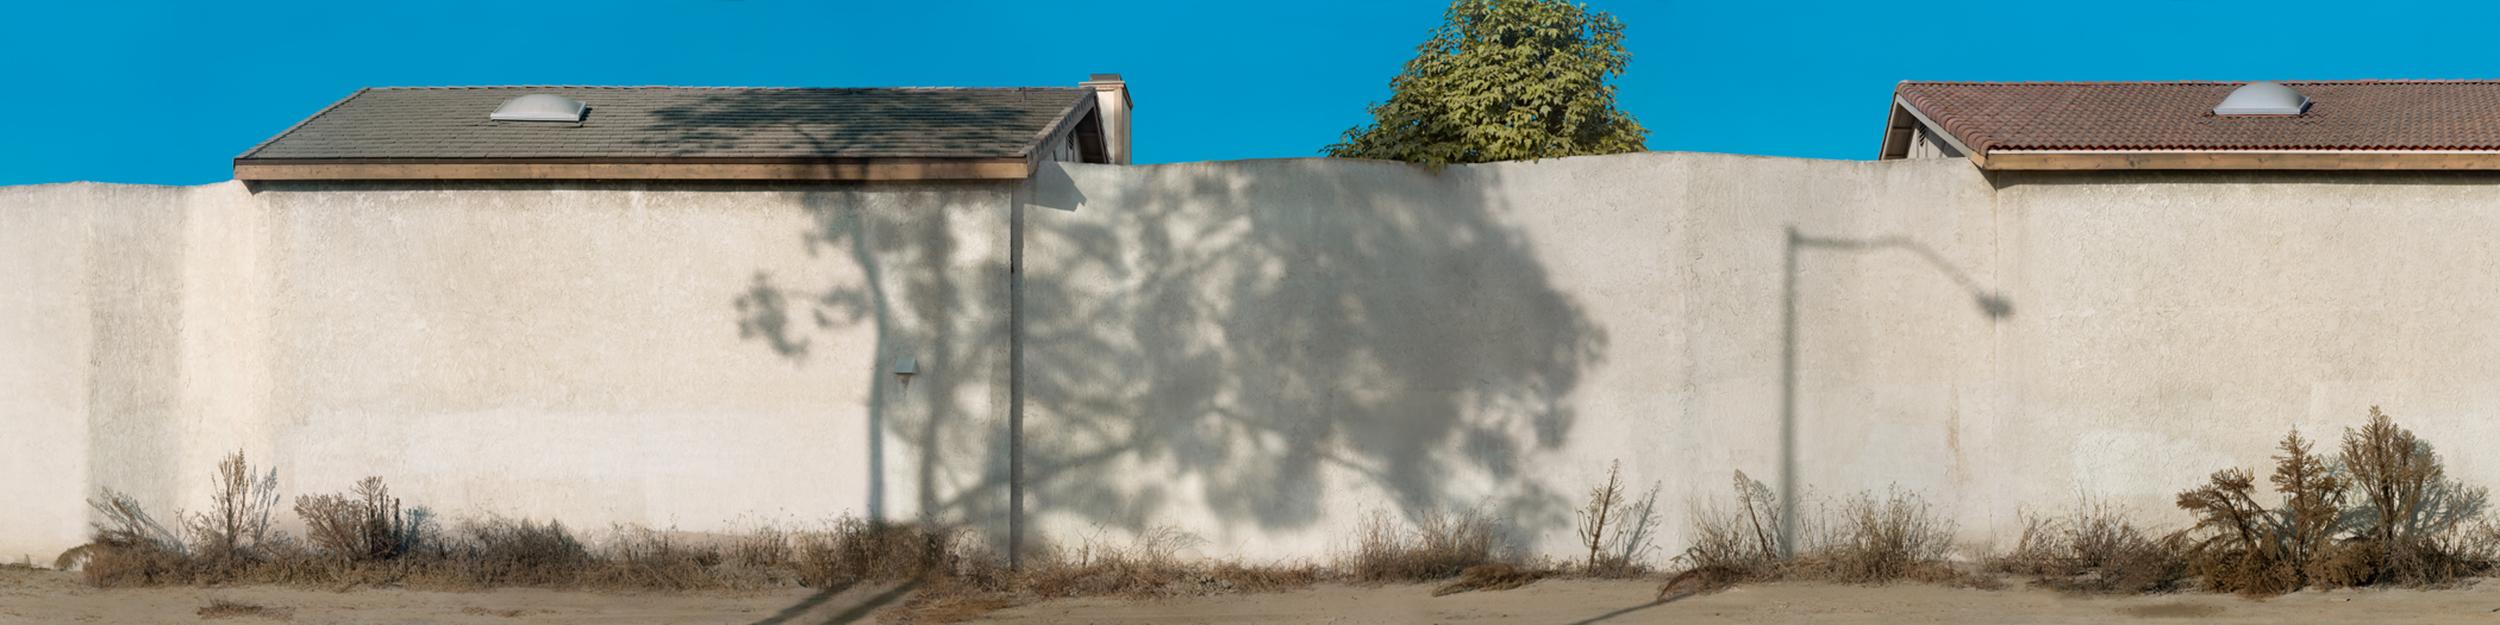 Afriges-20090823-4.jpg